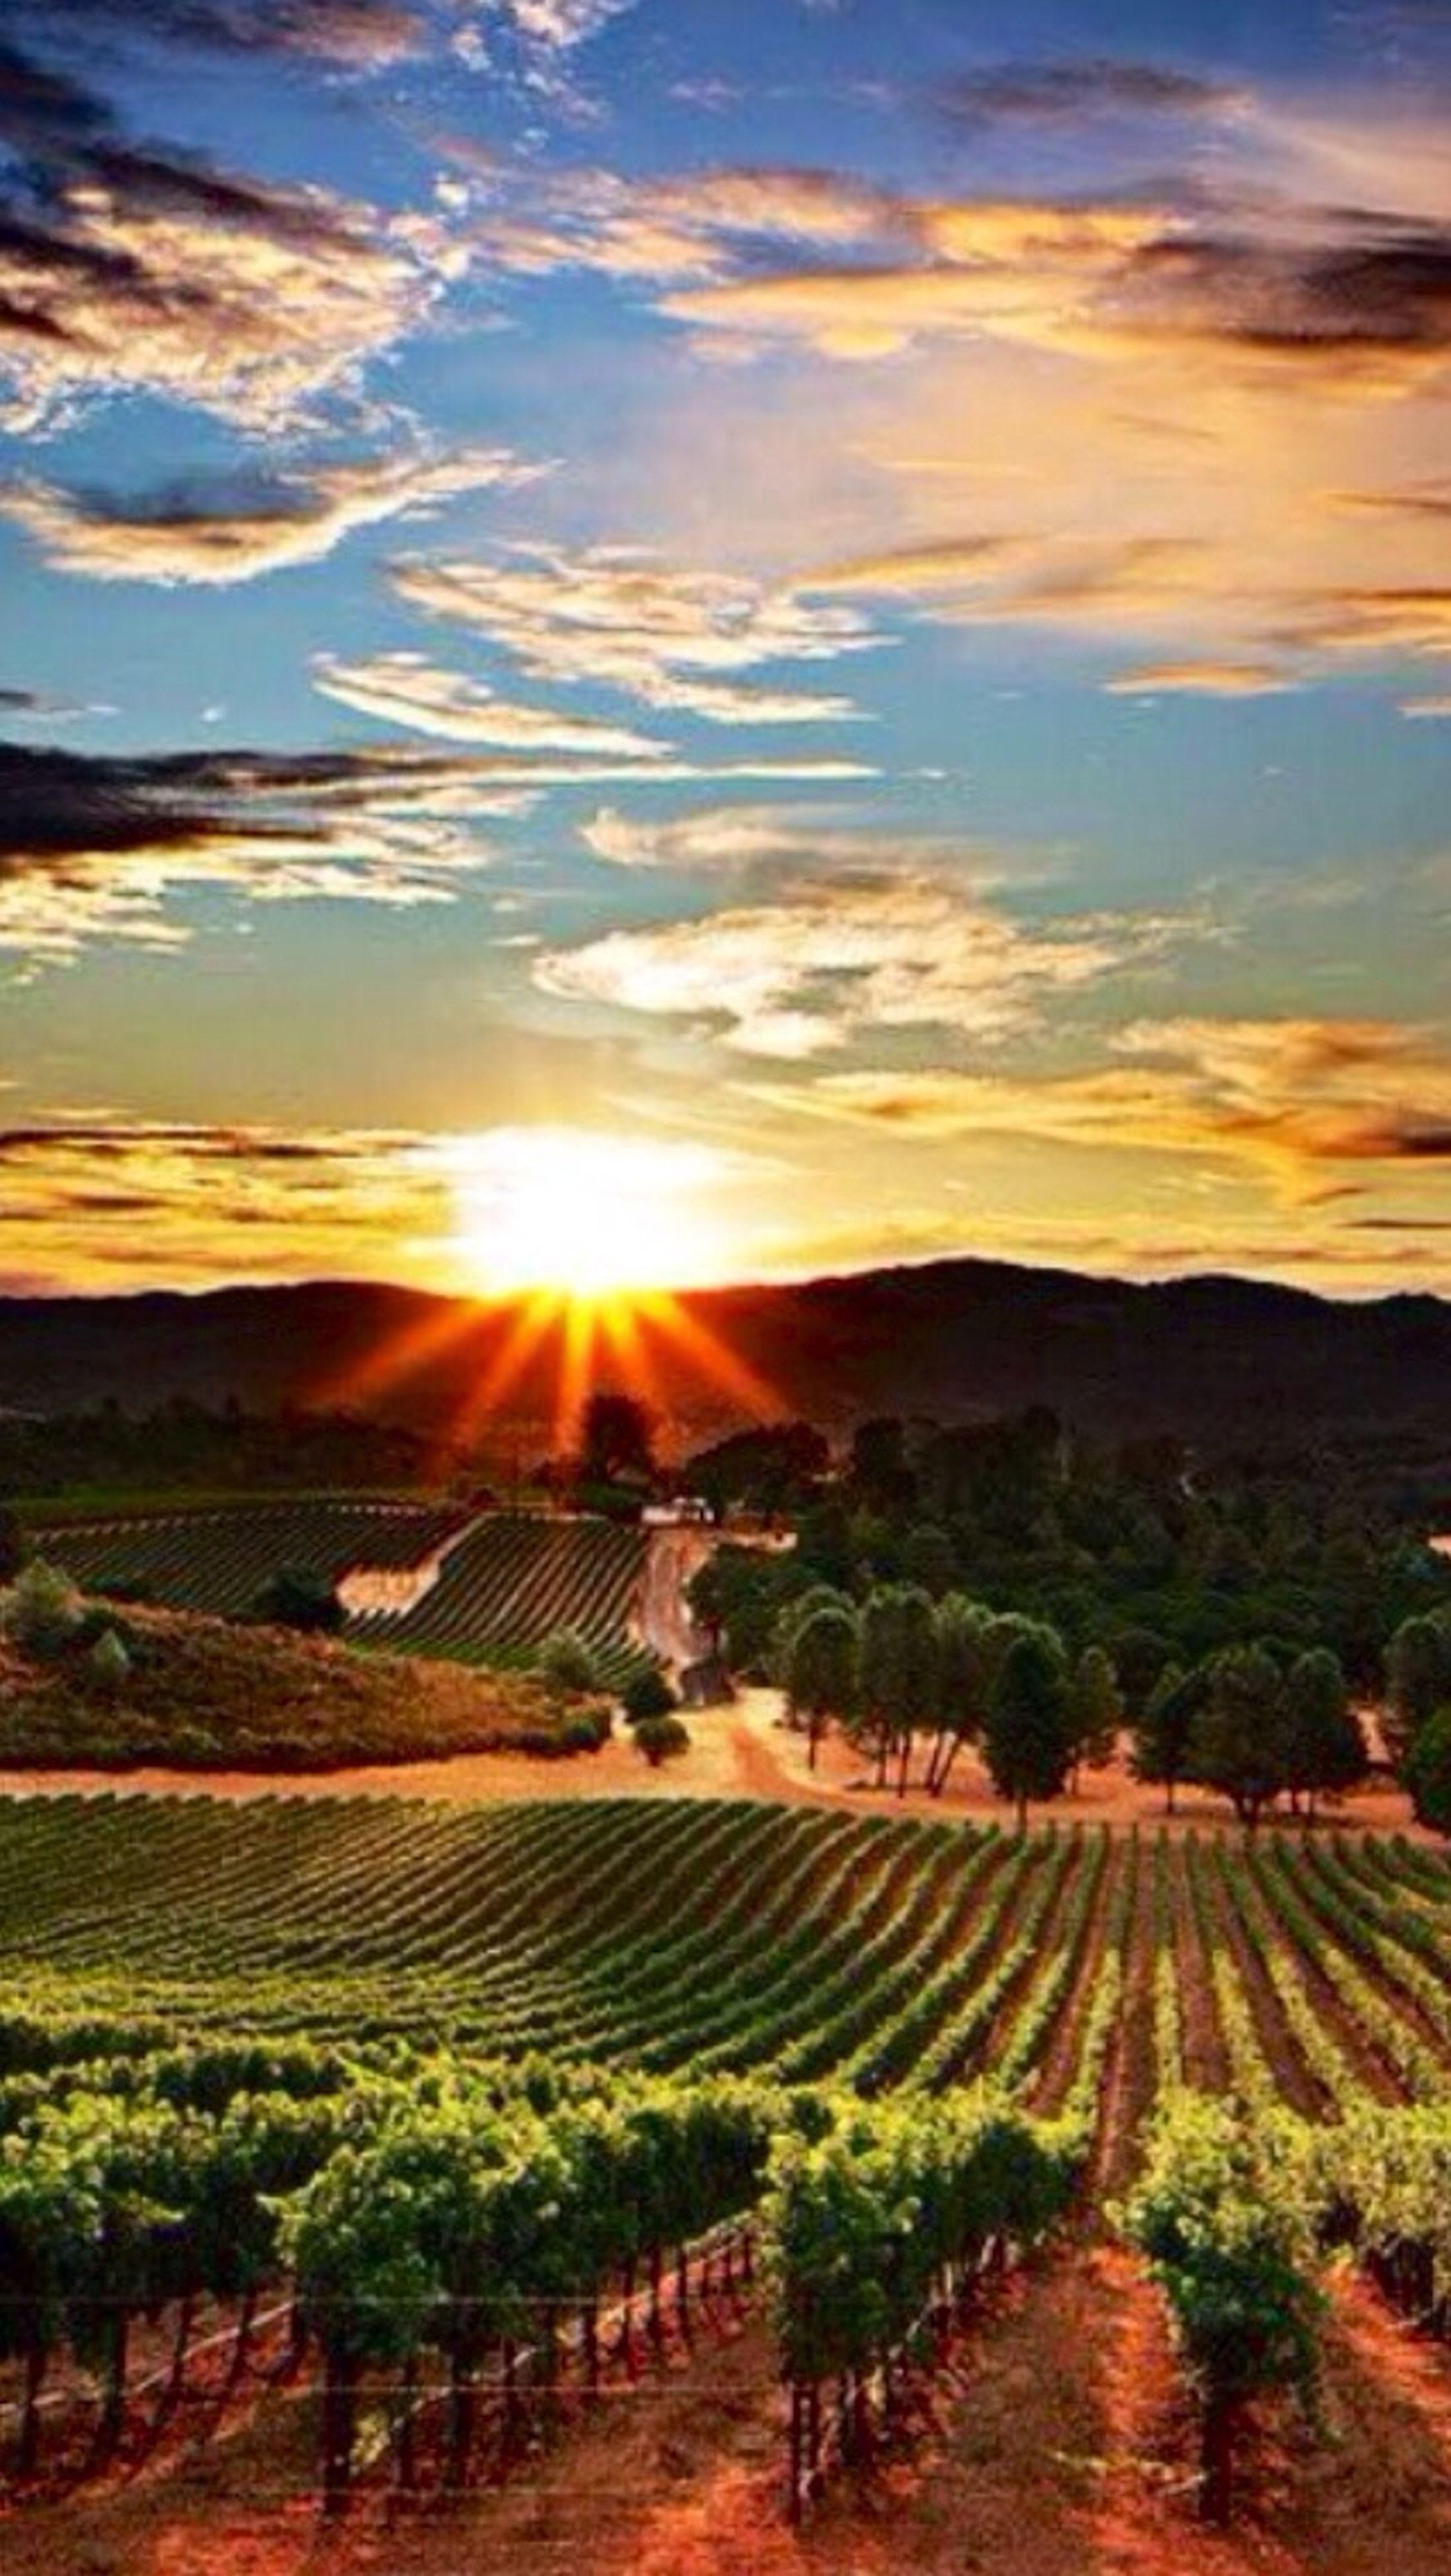 sunset, sun, tranquil scene, tranquility, landscape, scenics, beauty in nature, sky, sunbeam, sunlight, nature, rural scene, idyllic, agriculture, orange color, field, lens flare, cloud - sky, farm, tree